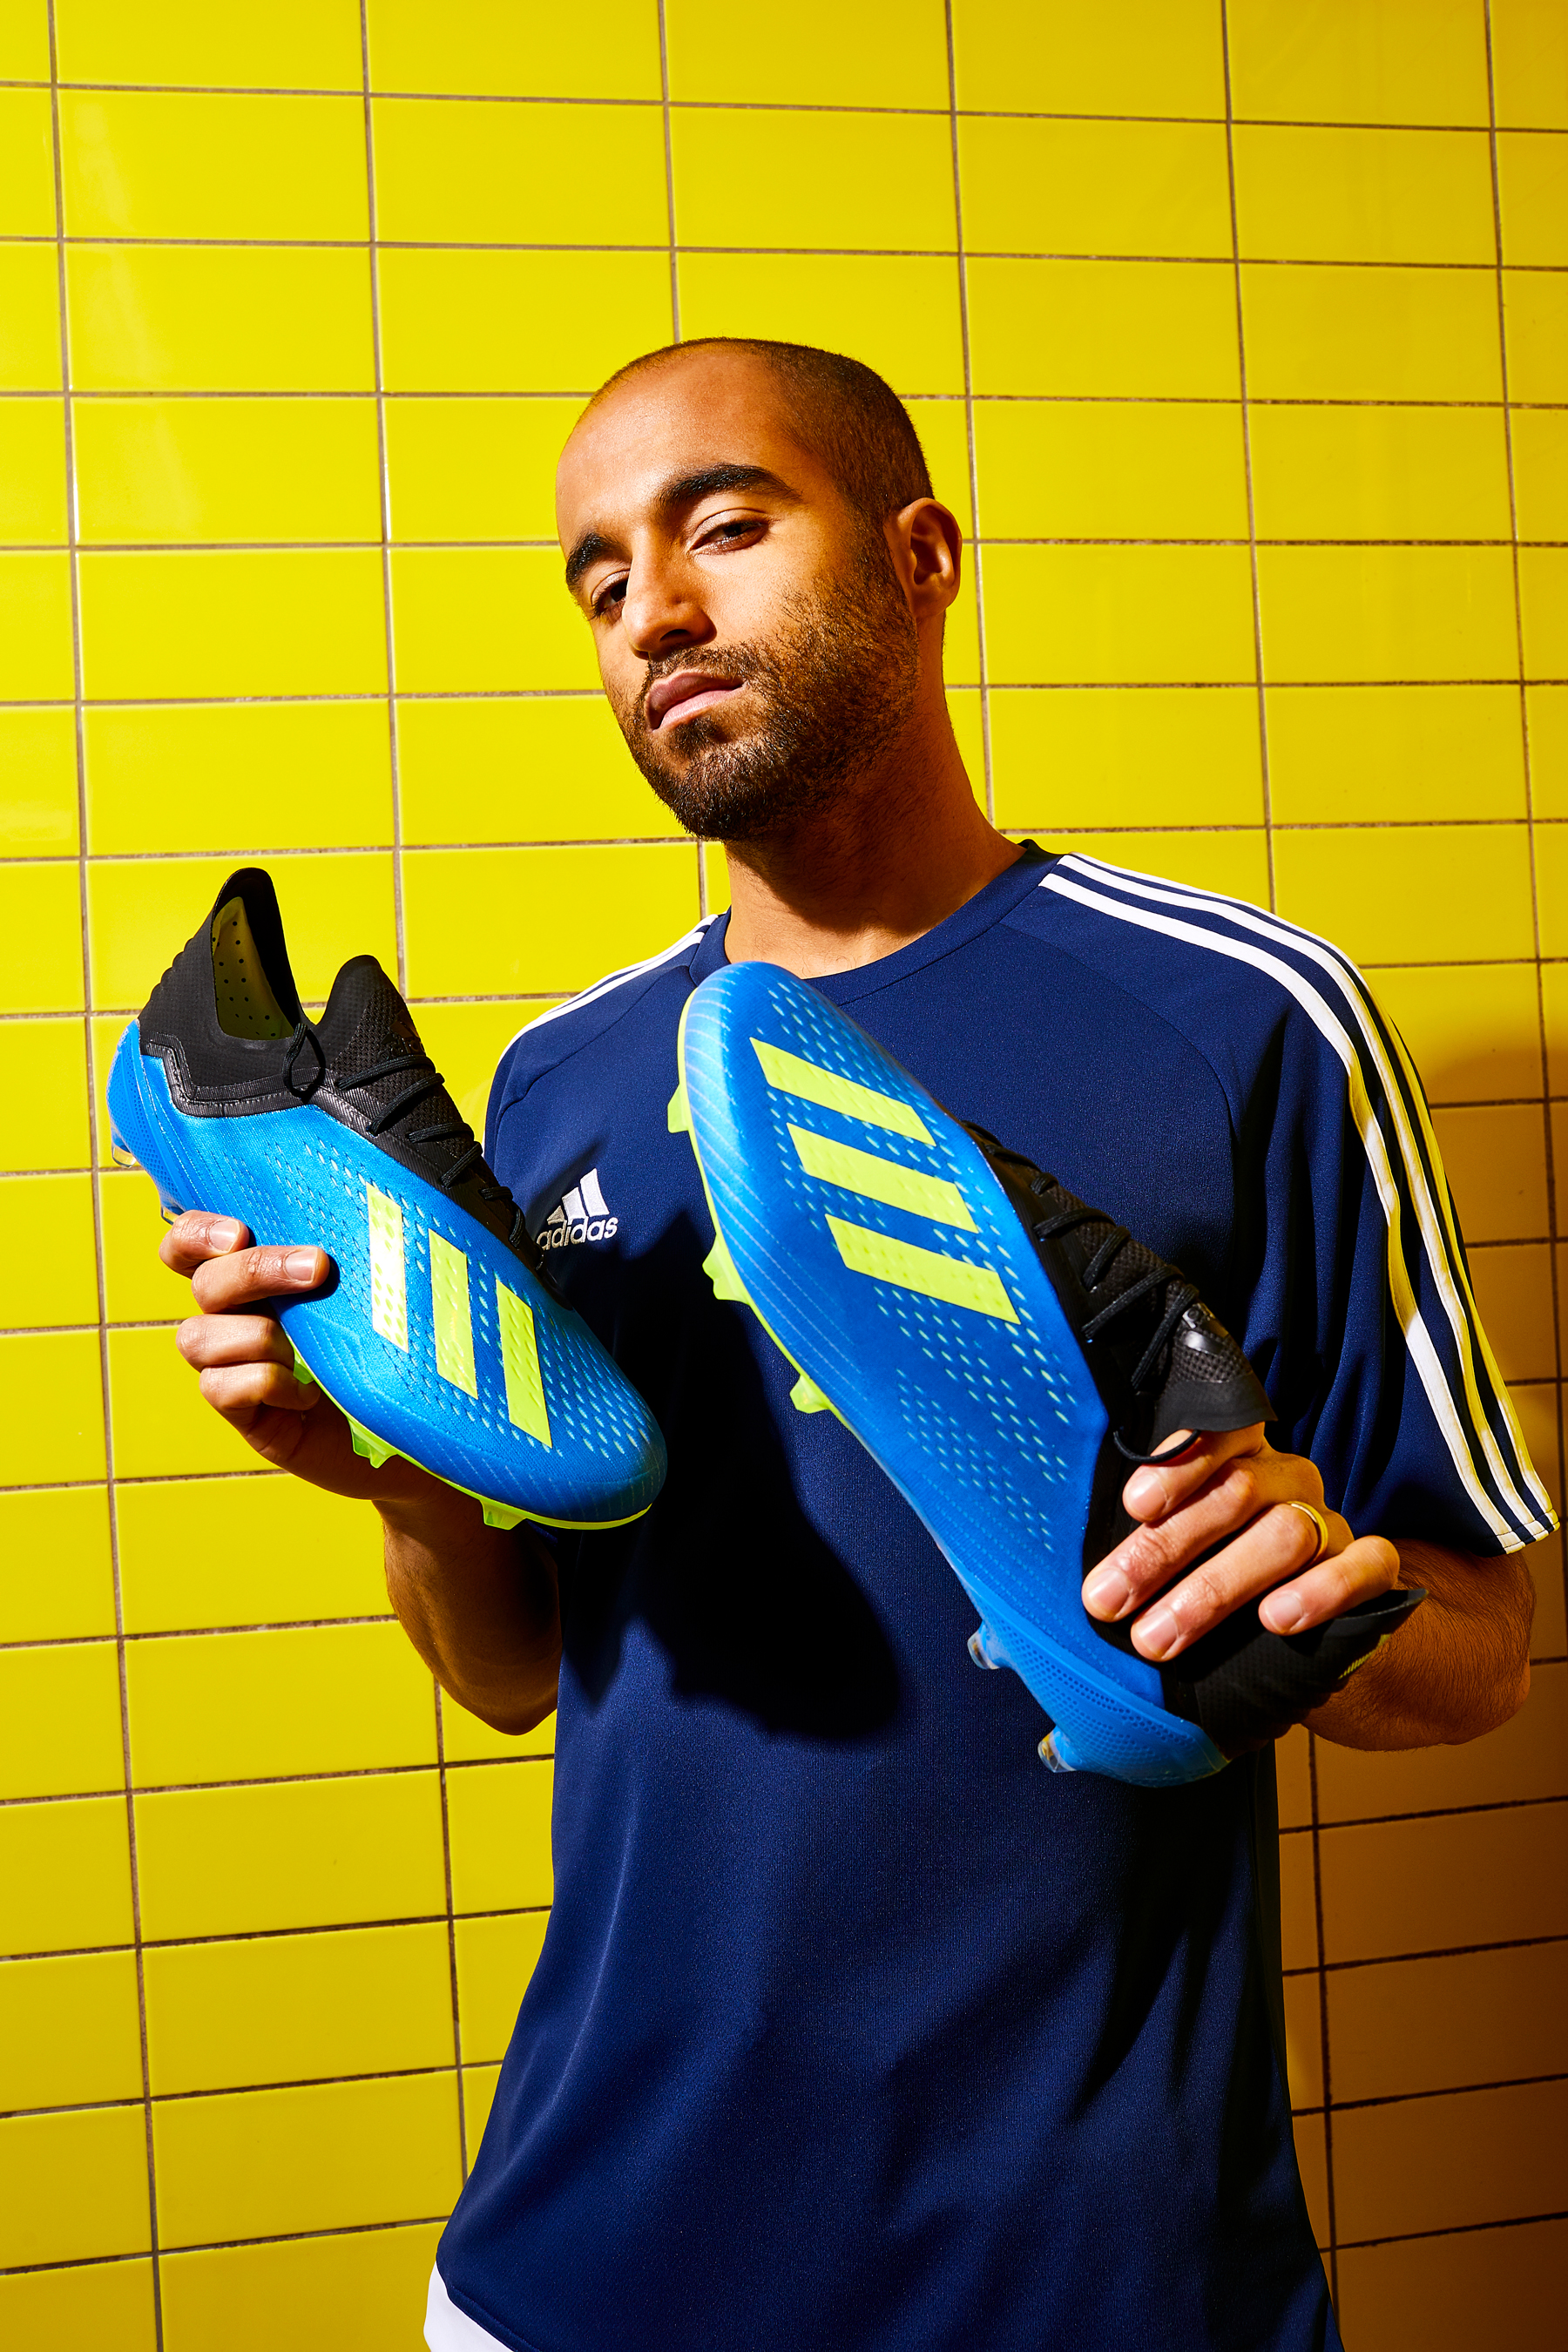 Lucas - Adidas